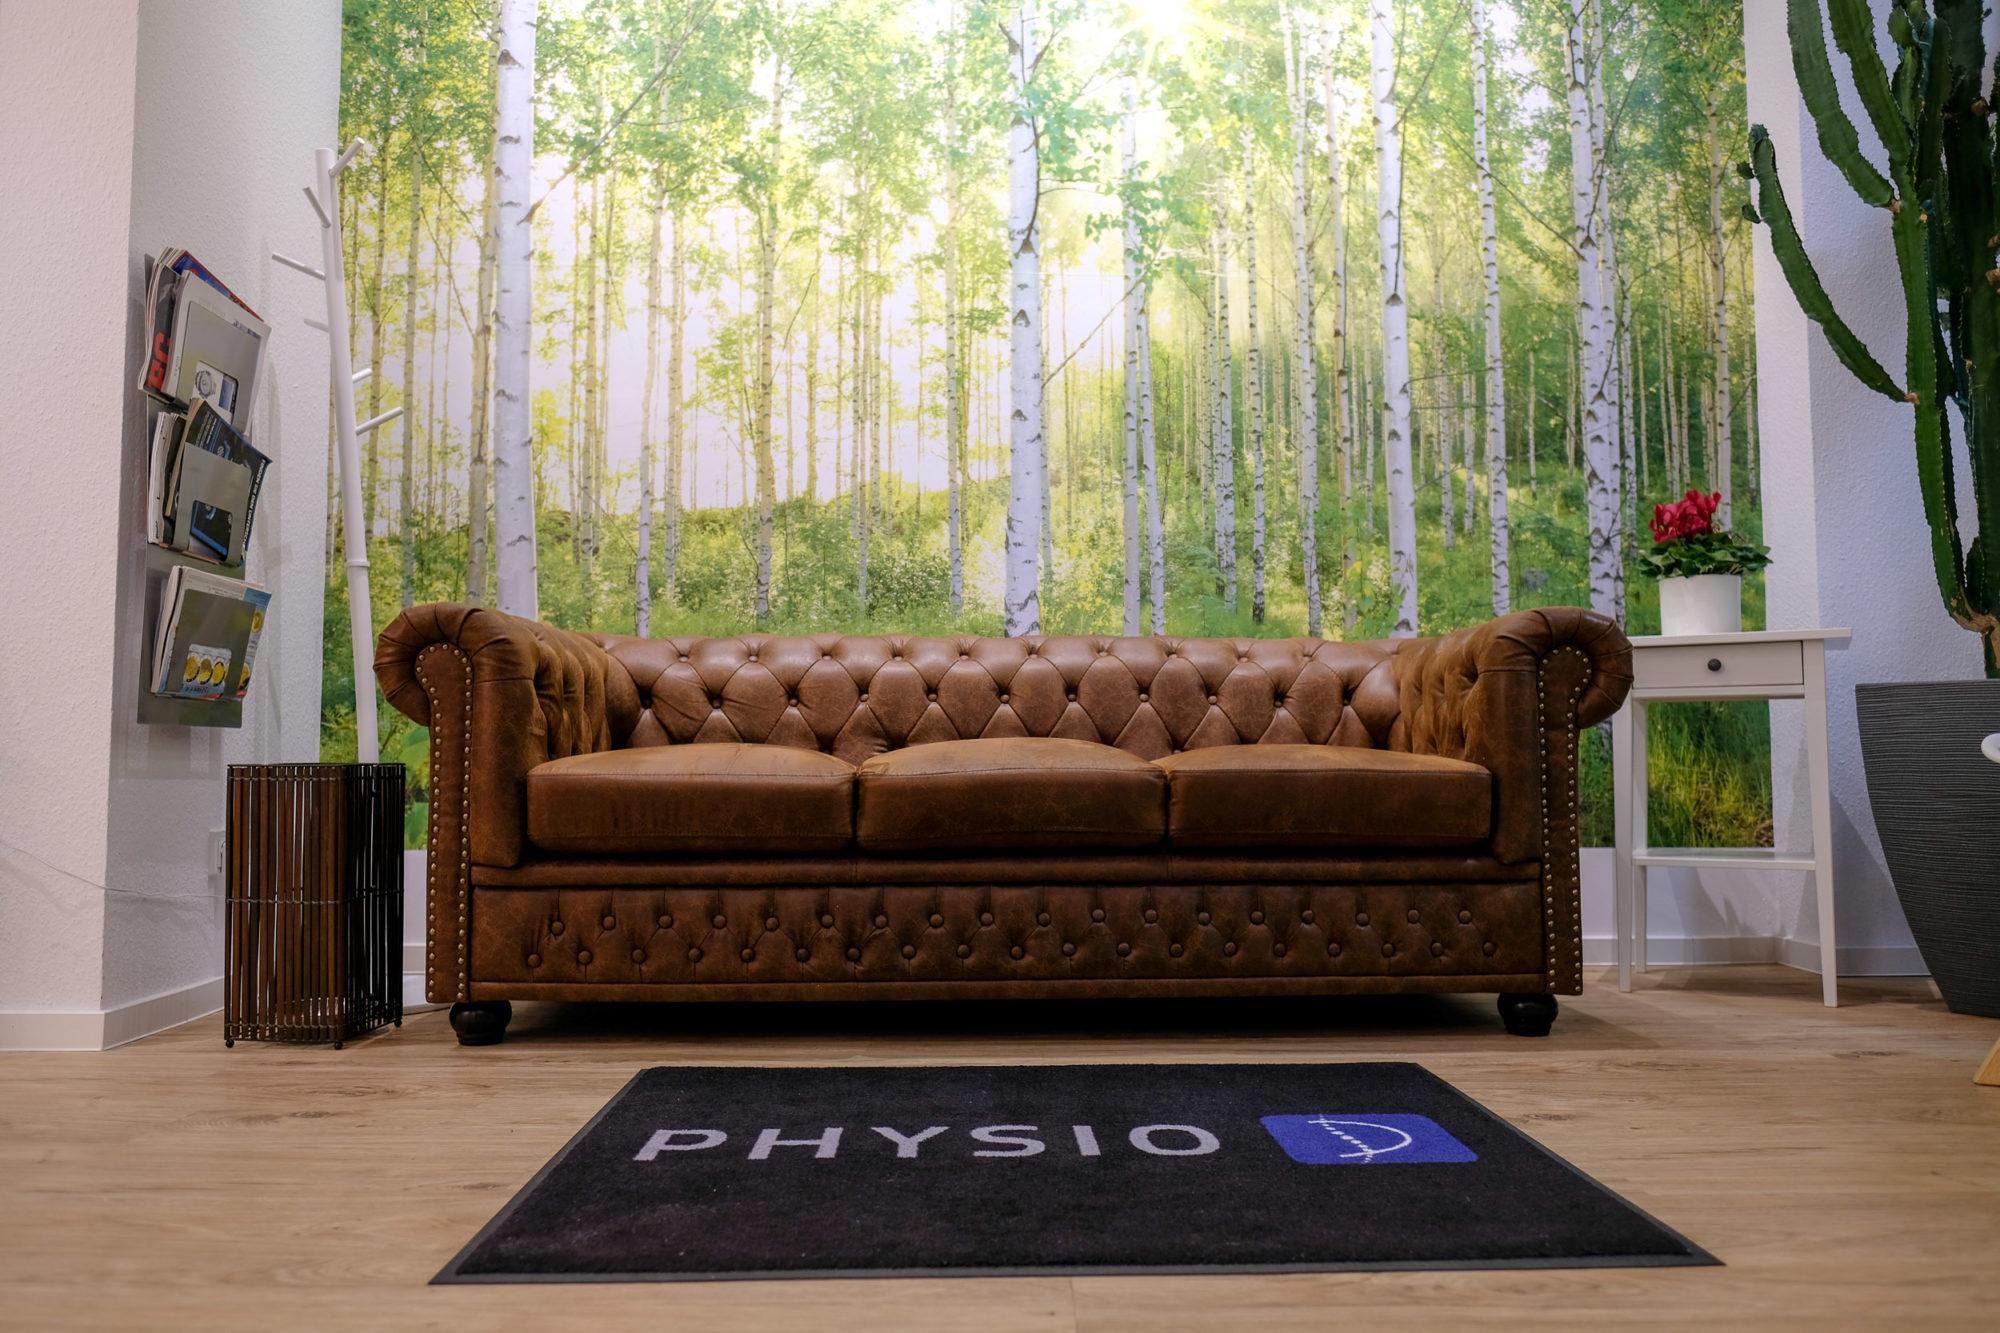 Physio-D